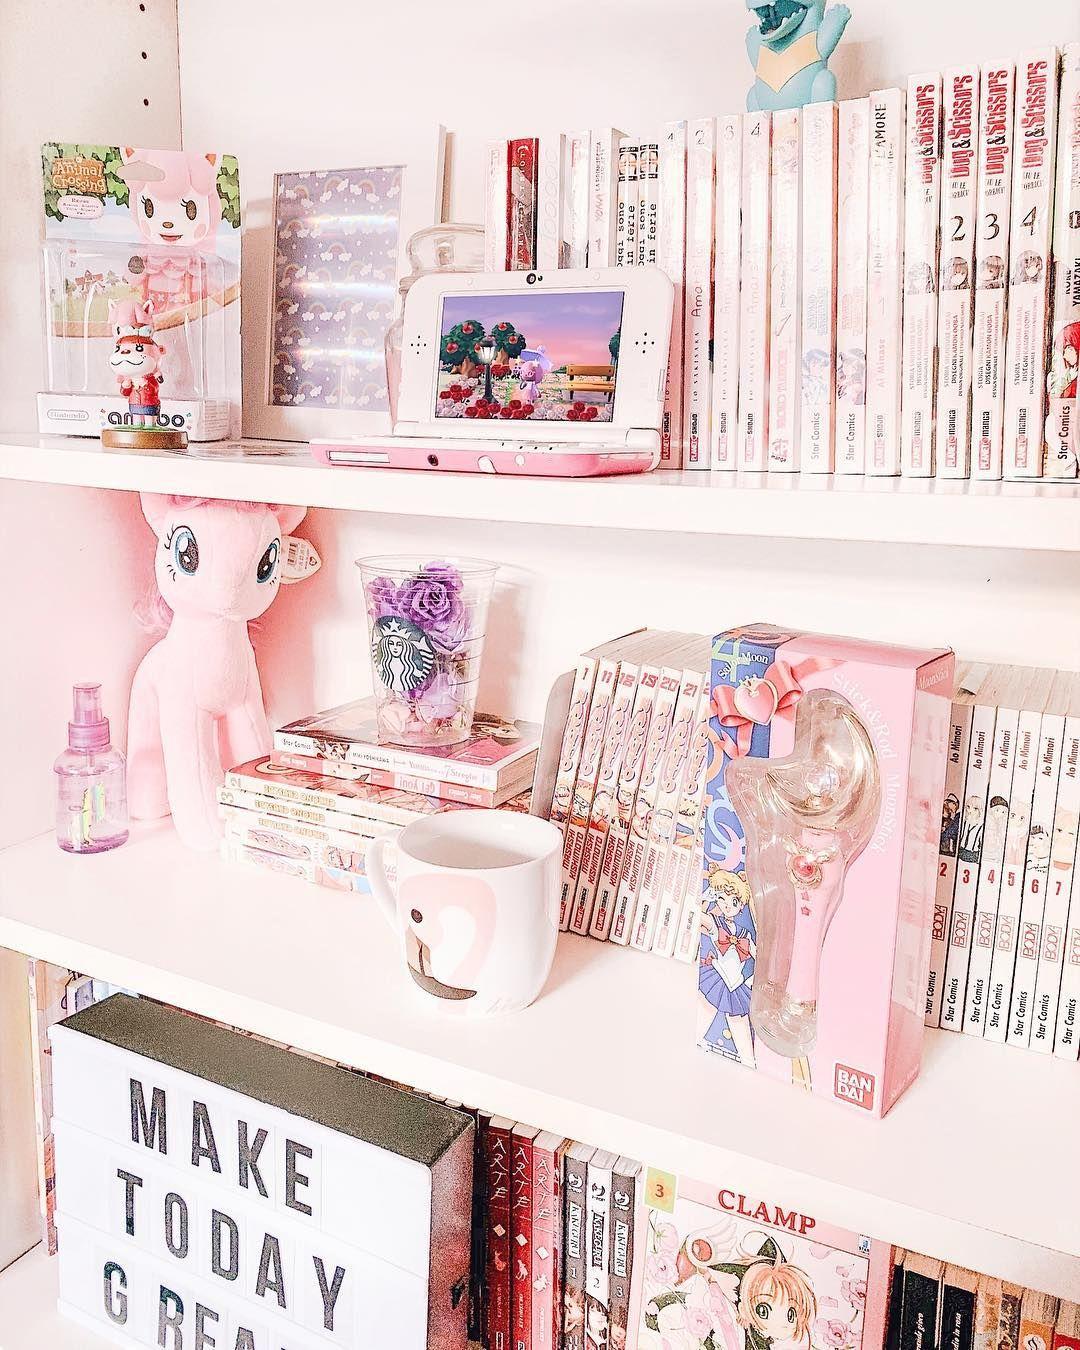 Kawaaii Manga Anime Sailormoon Mylittlepony Bookshelves Bookshelf Mangacollection Pastelkawaii Otaku Room Kawaii Bedroom Cute Diy Room Decor